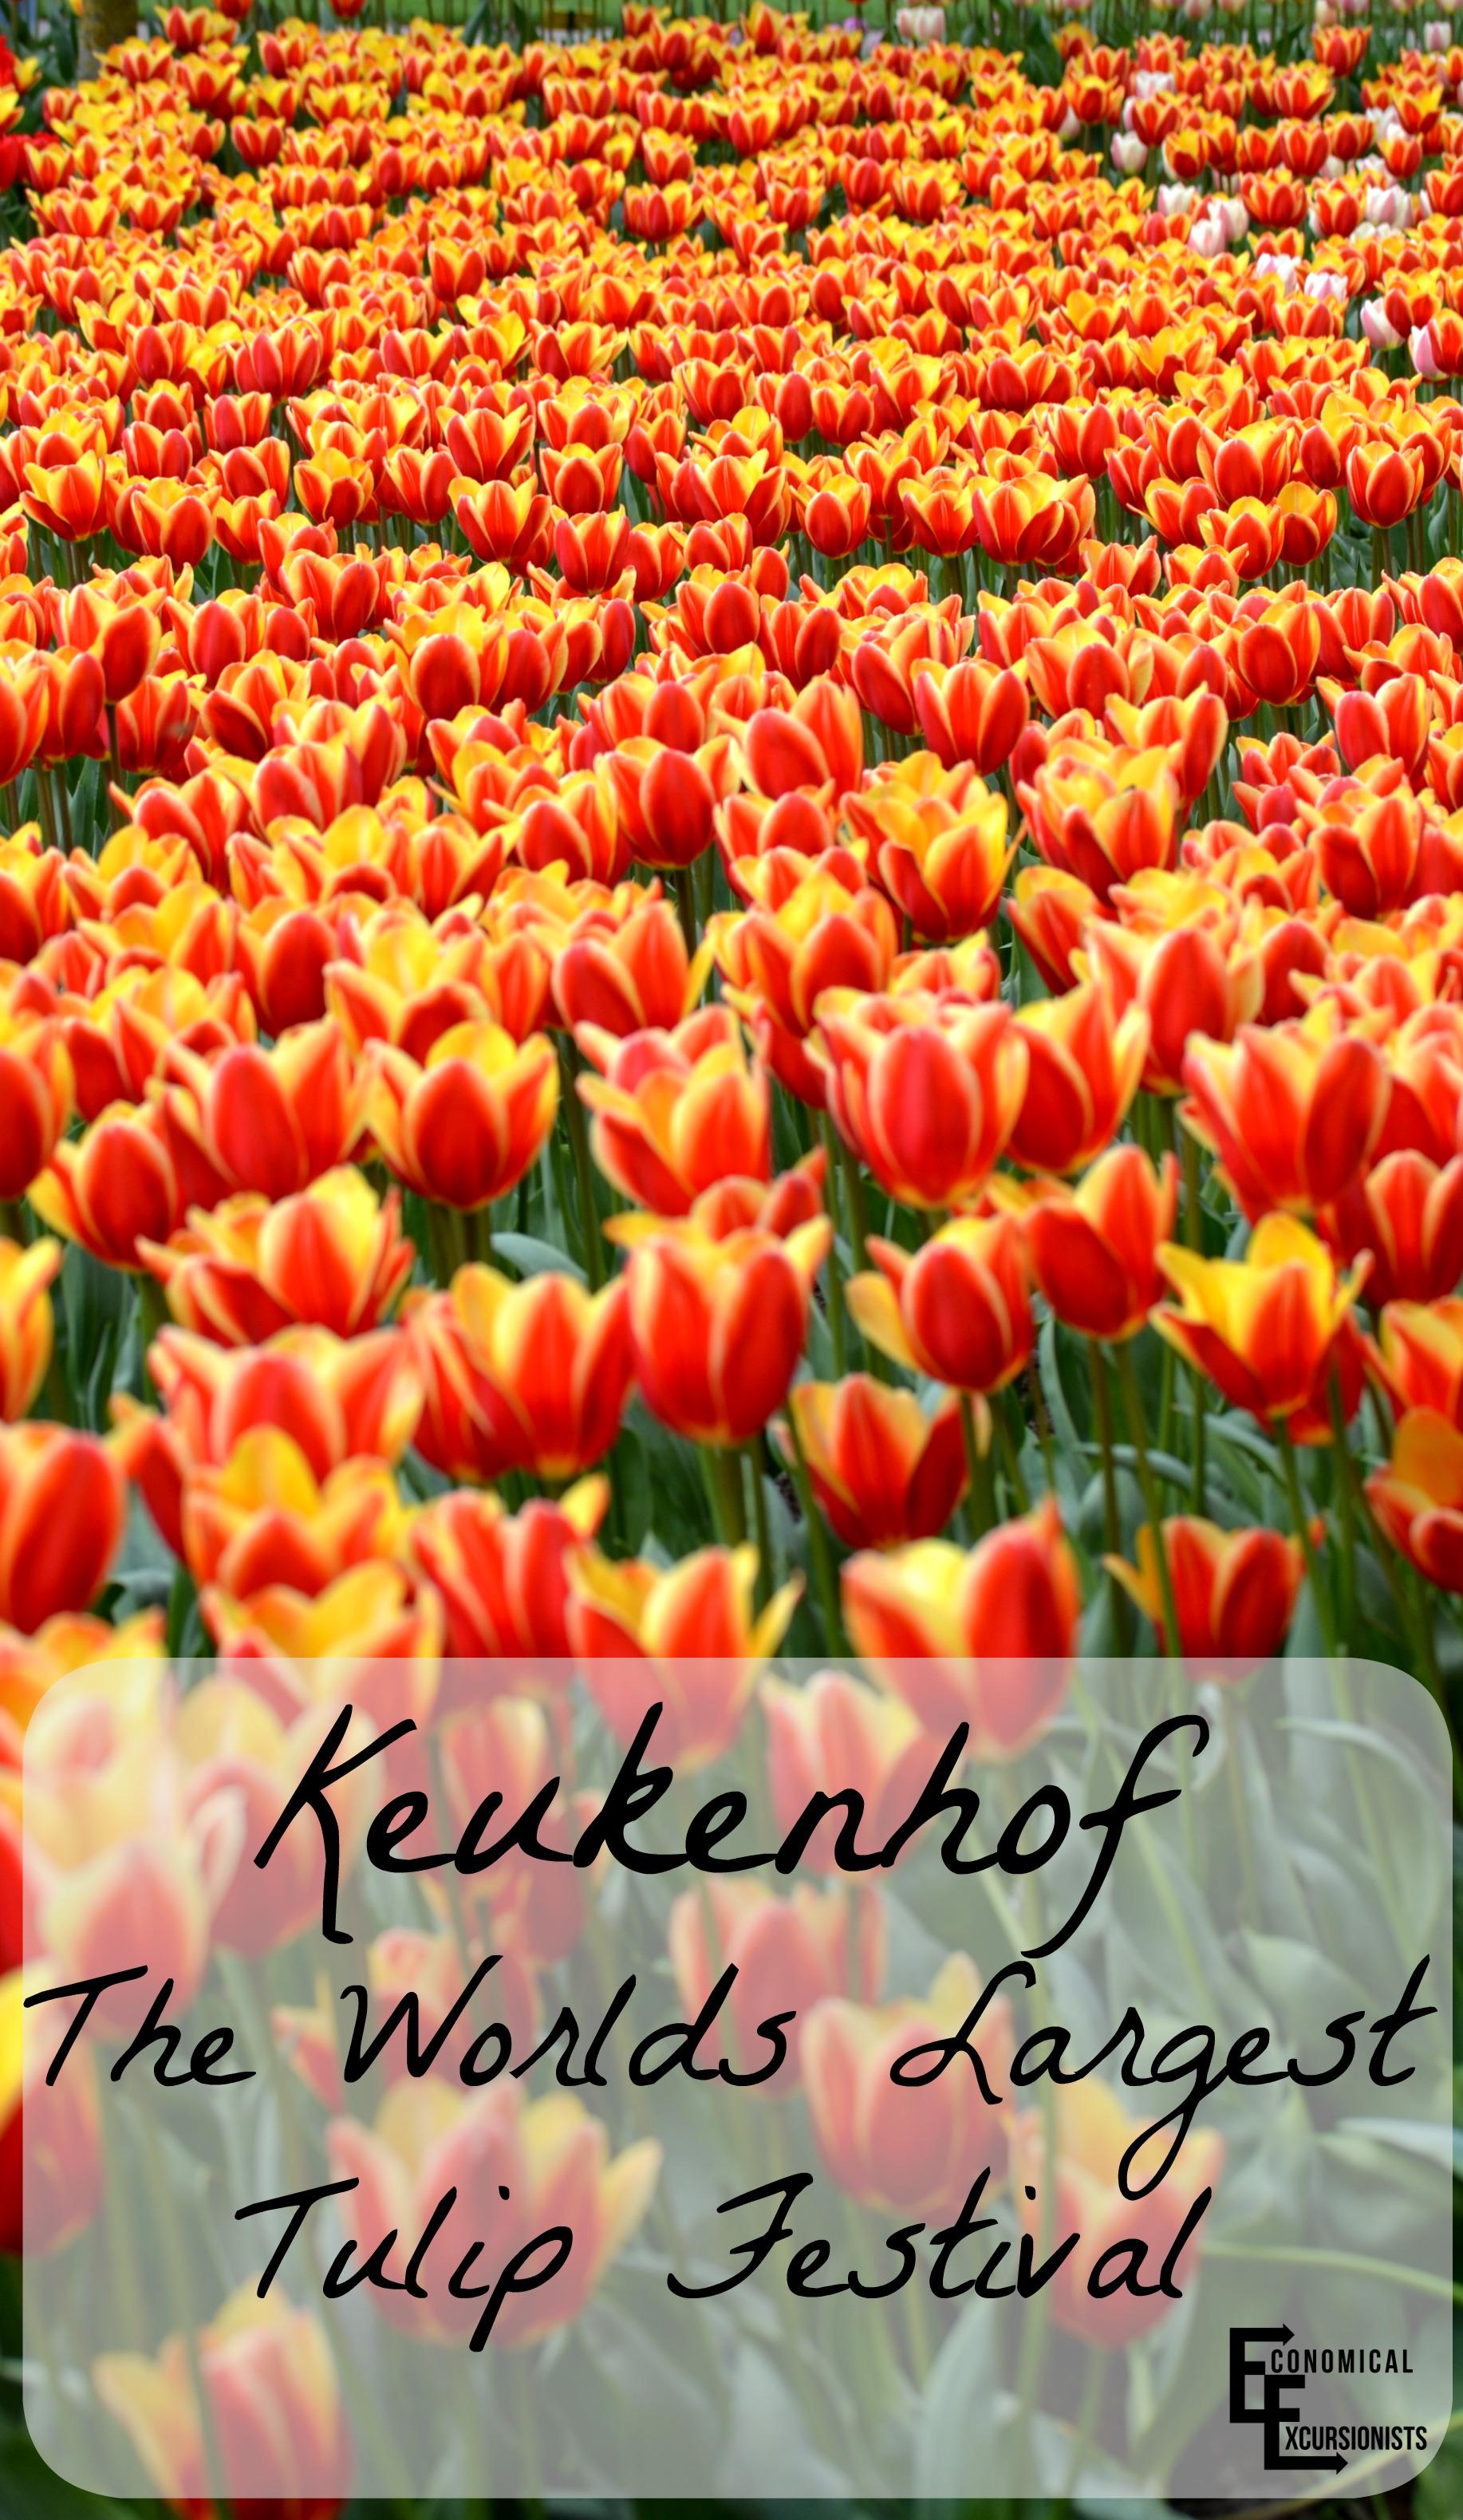 keukenhof tulip festival. Black Bedroom Furniture Sets. Home Design Ideas